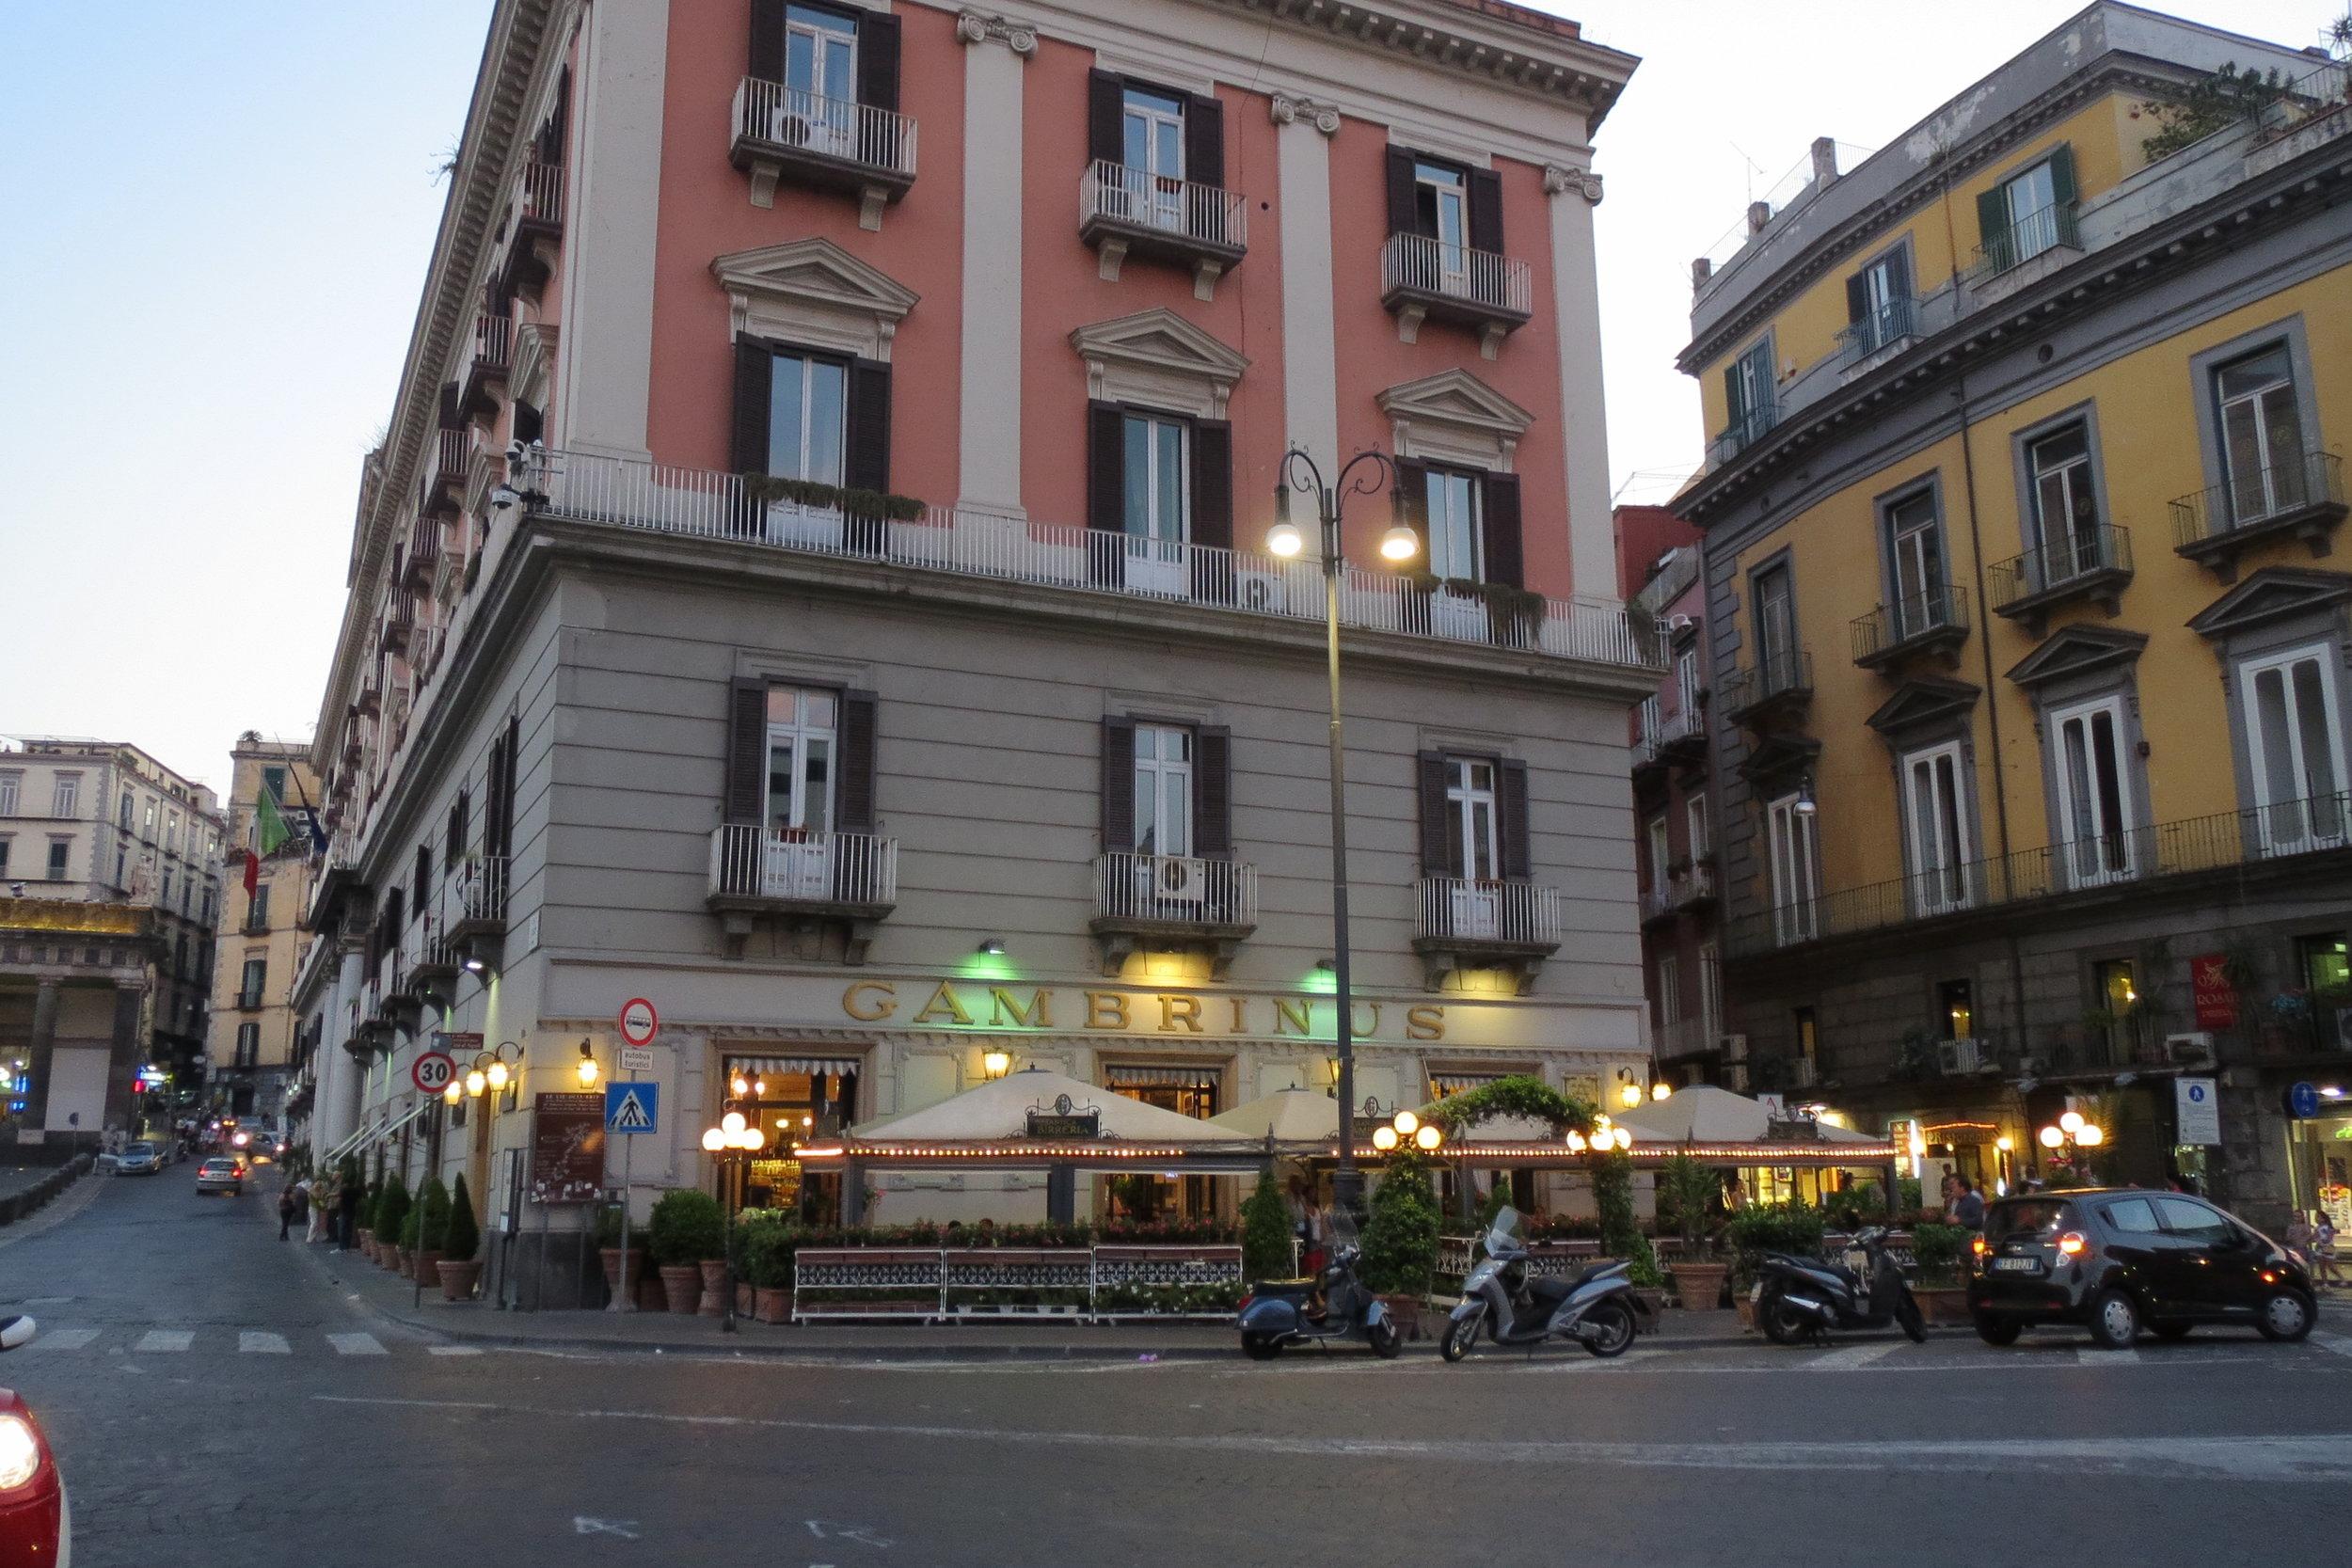 The caffe' Gambrinus, via Chiaia 1/2, 80132.